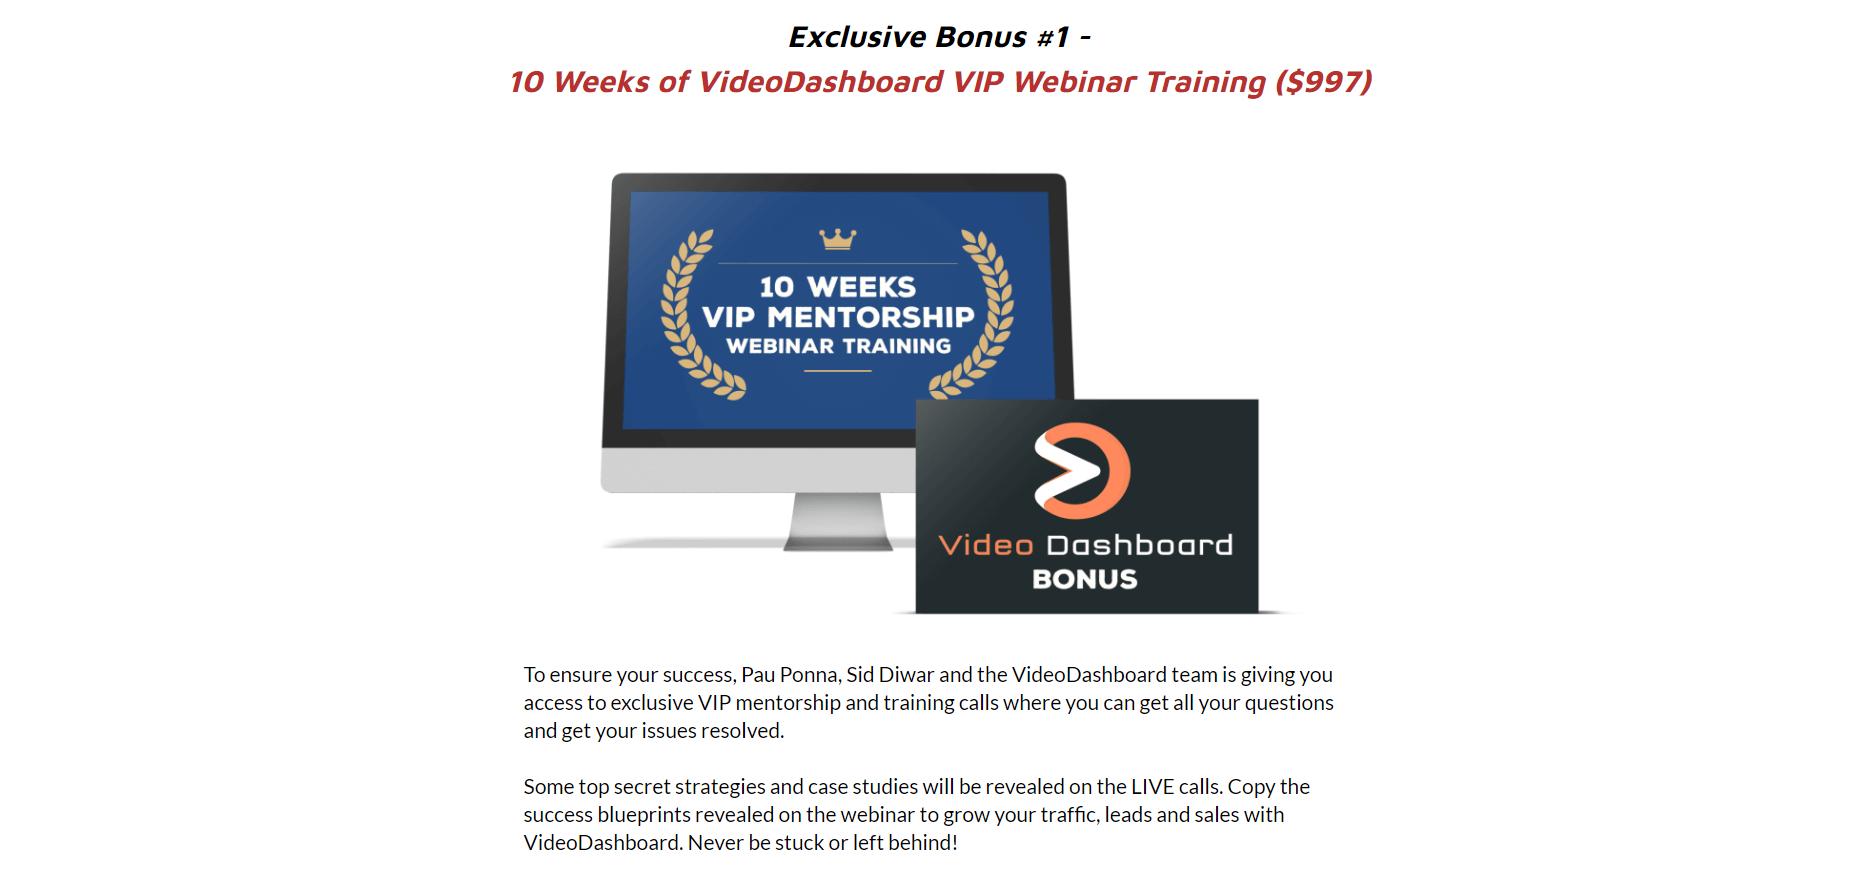 Video-Dashboard-Bonus-1